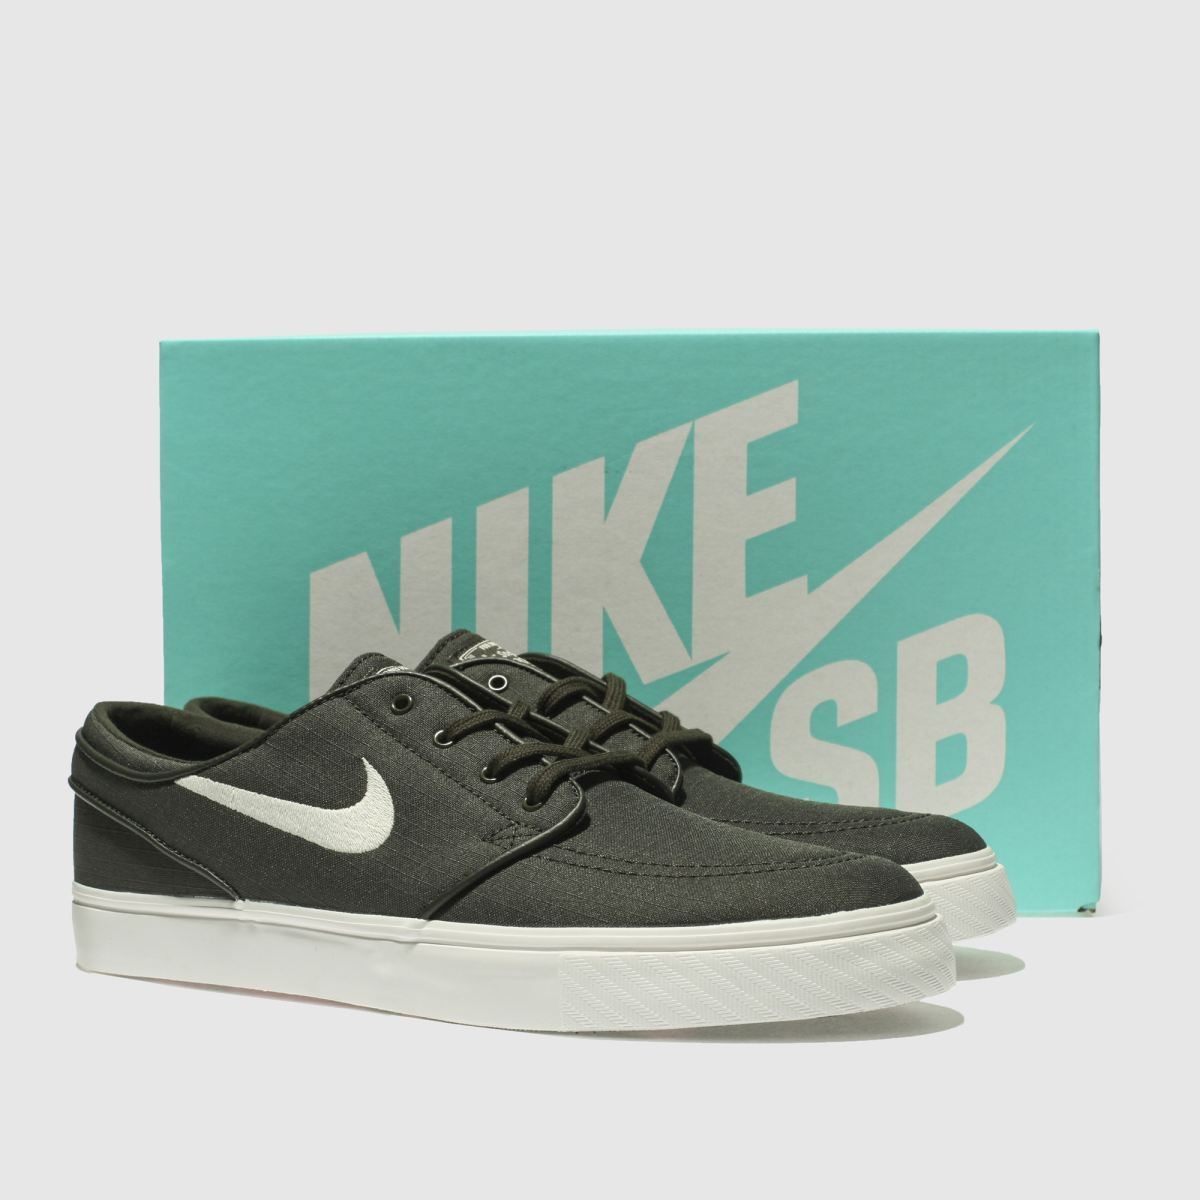 Herren Khaki nike Sneaker sb Zoom Stefan Janoski Sneaker nike | schuh Gute Qualität beliebte Schuhe 349866